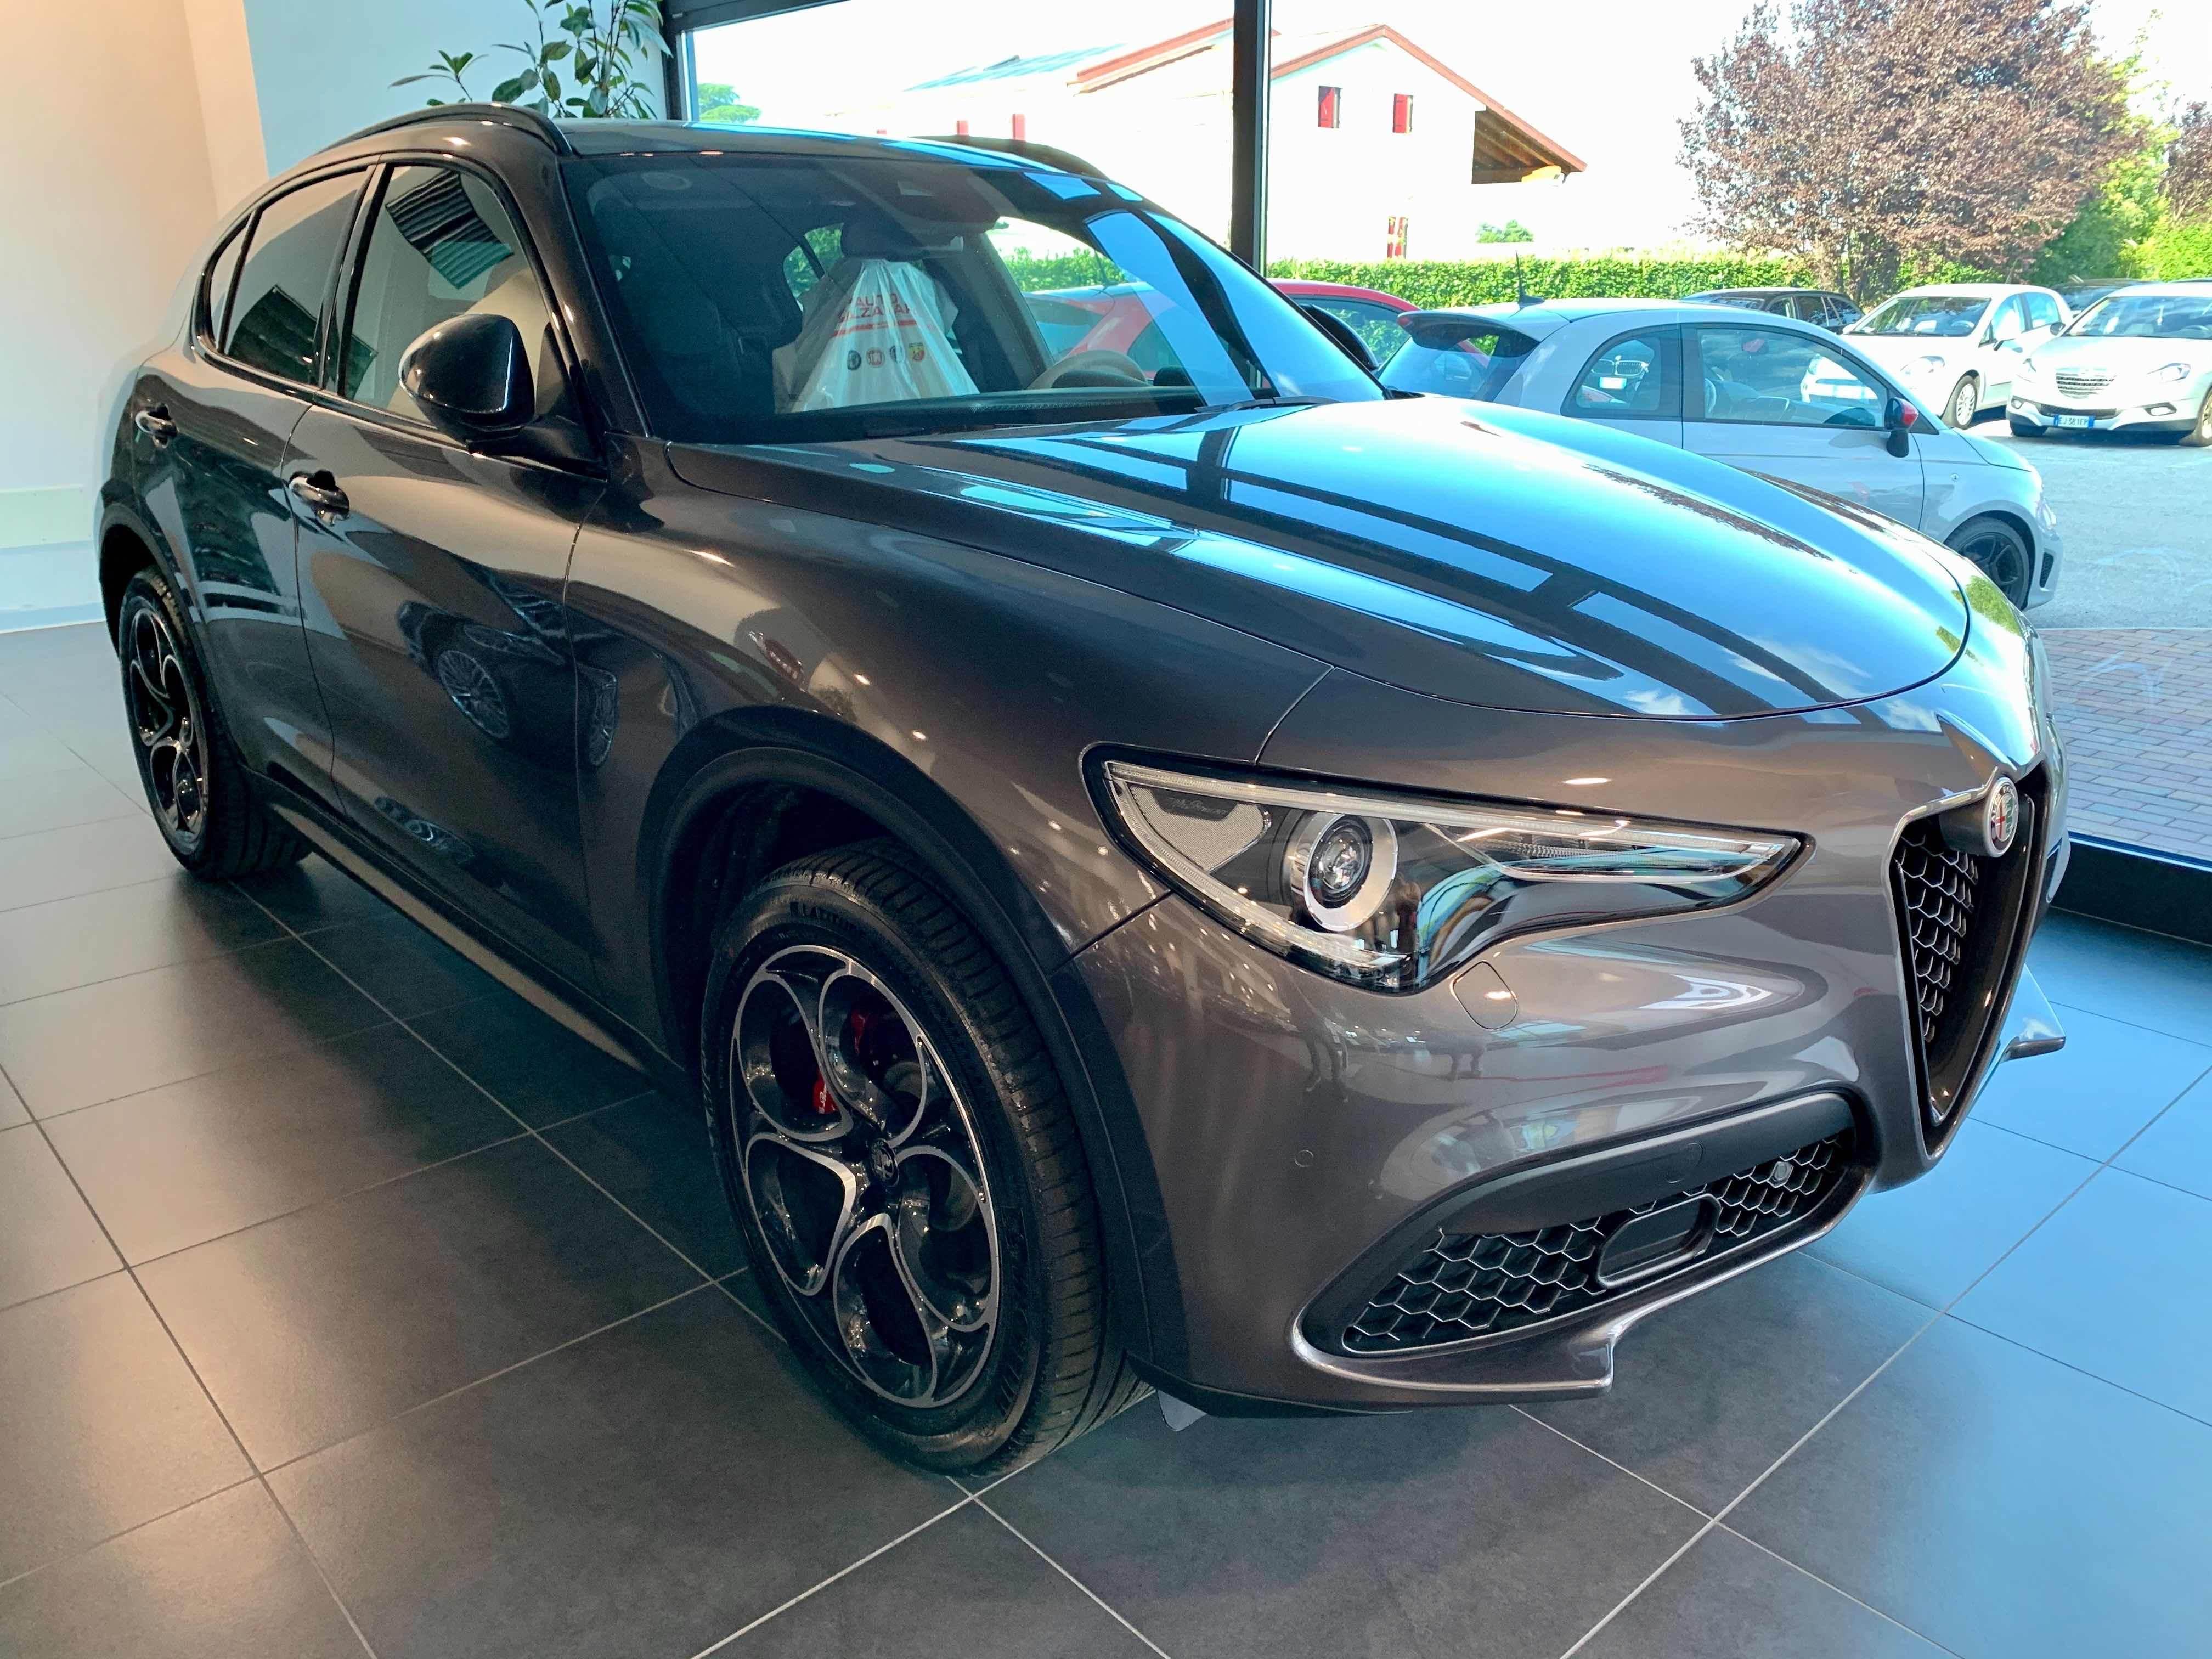 foto Alfa Romeo Stelvio- 2.0 TB 200cv - AT8 - Q4 - B-Tech my18 - Grigio Vesuvio - 2020 - MO - 2